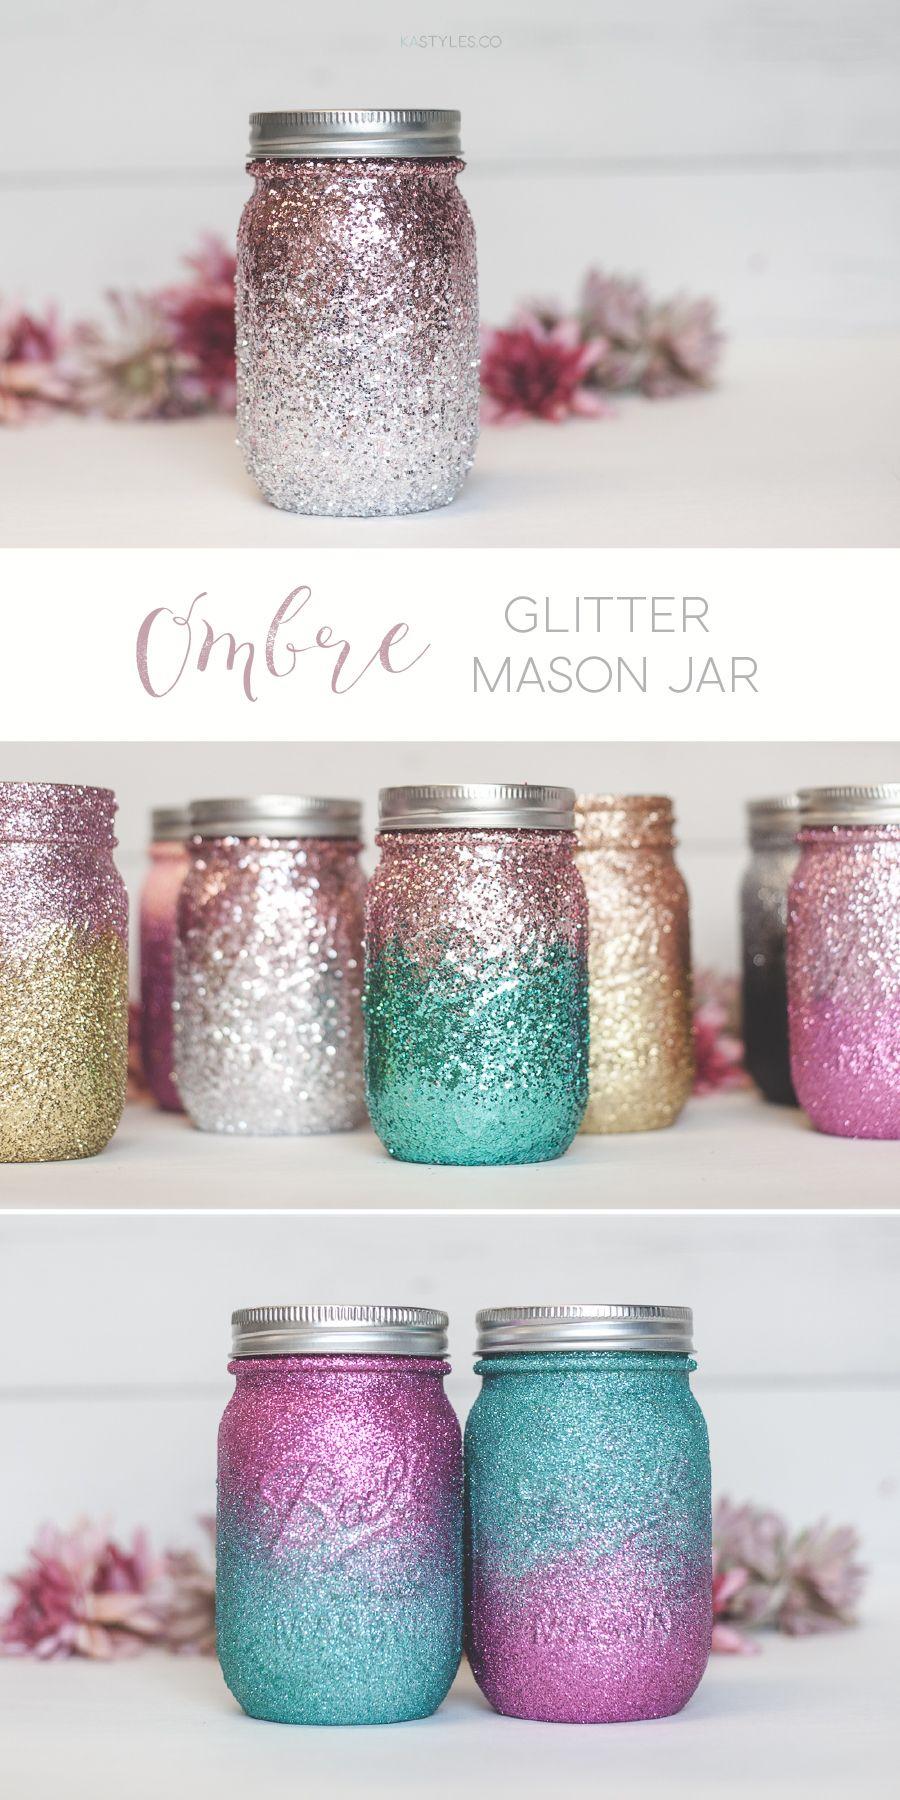 Ombre Glitter Mason Jars images